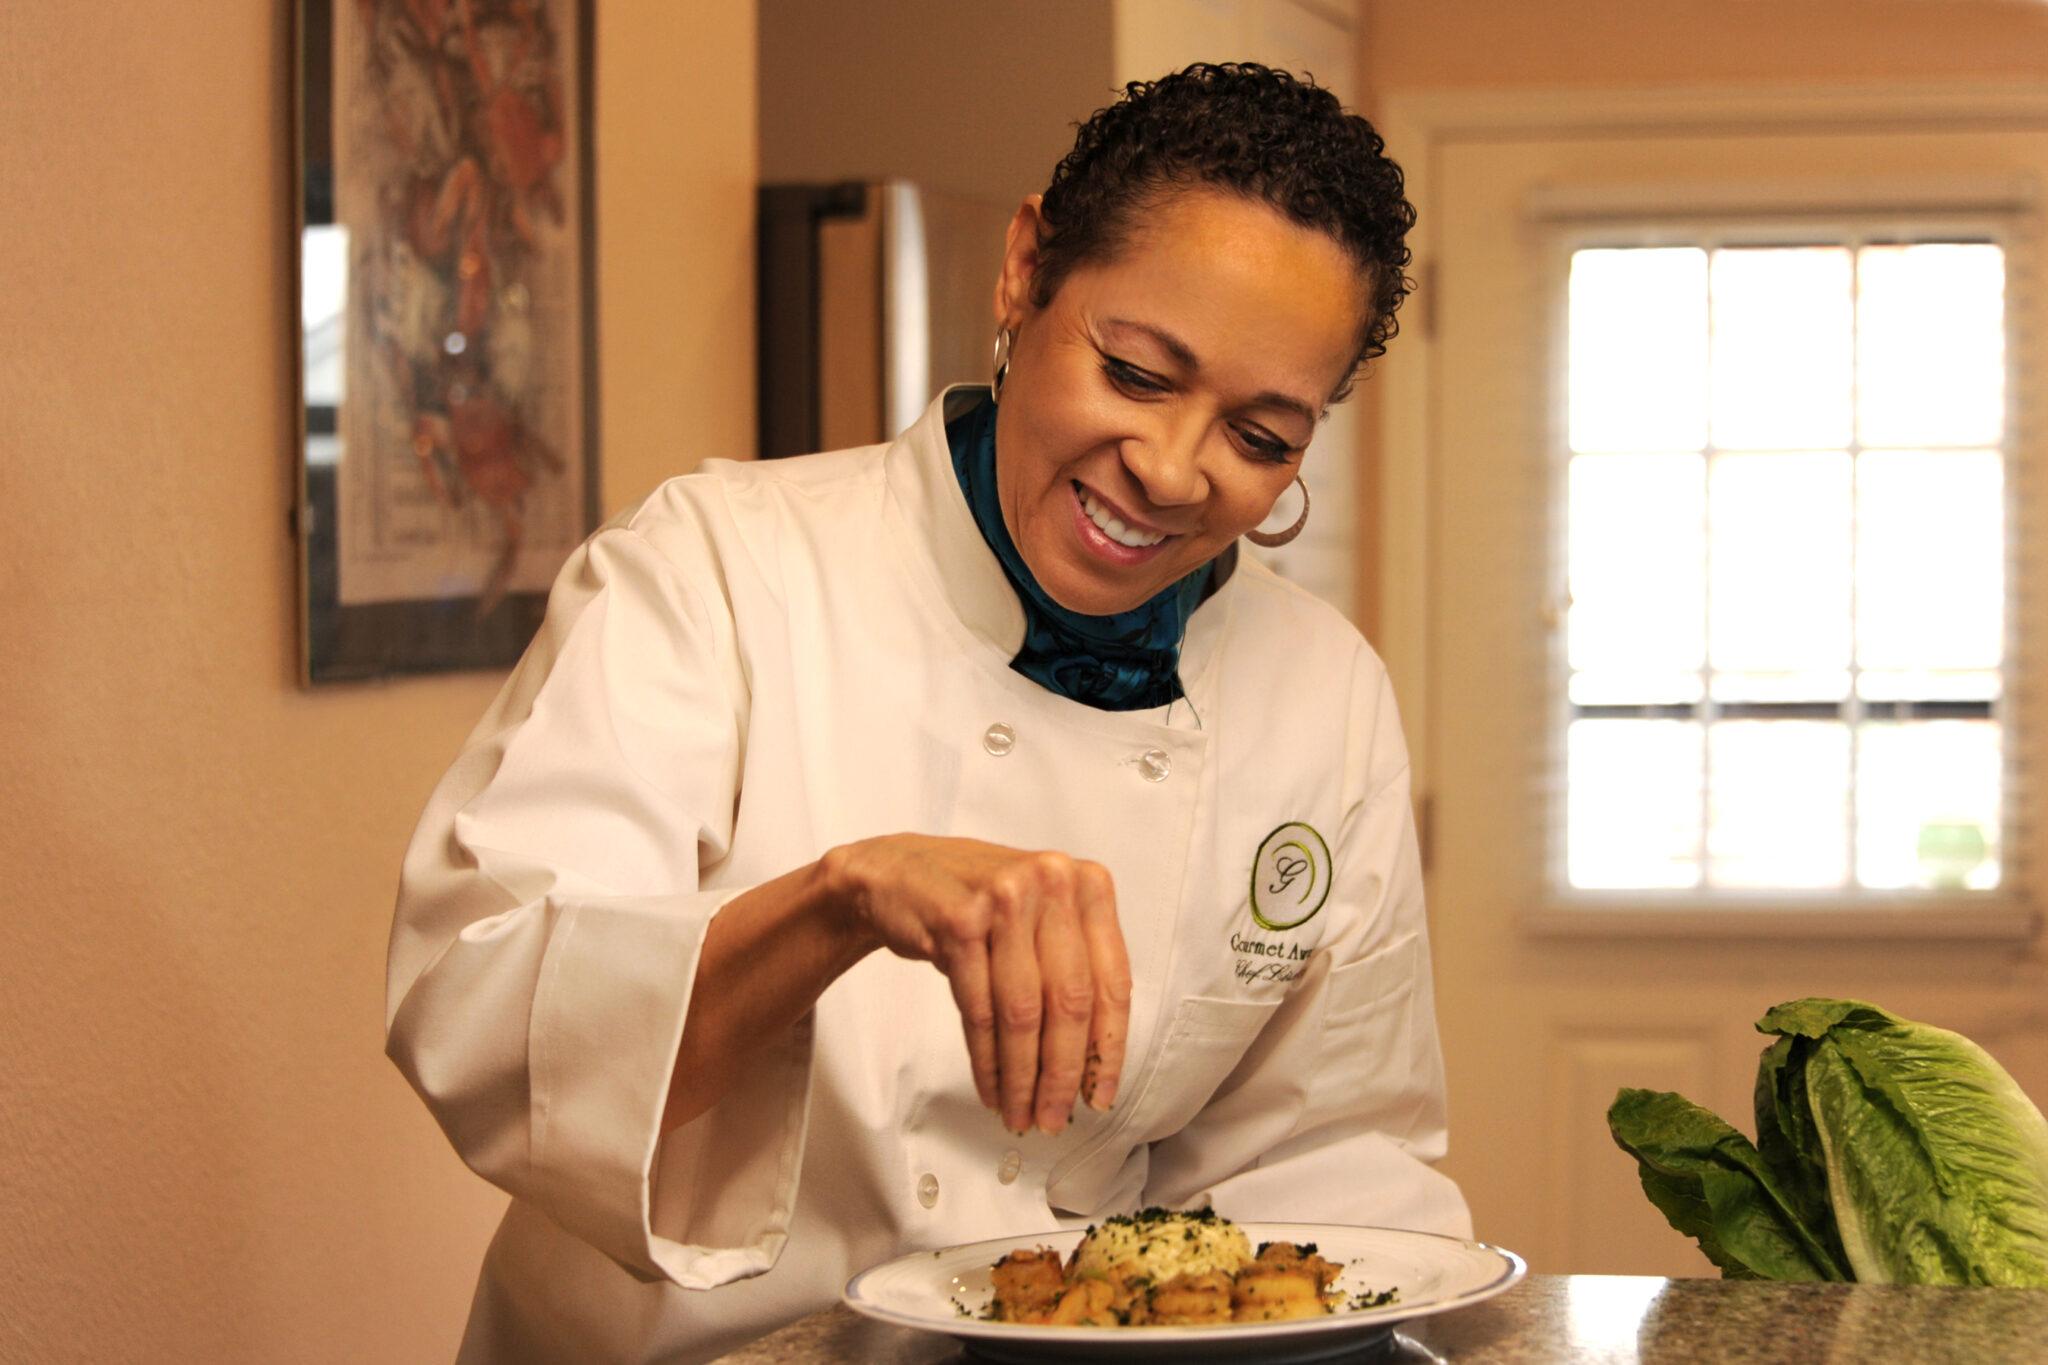 Chef Lisa Cooking